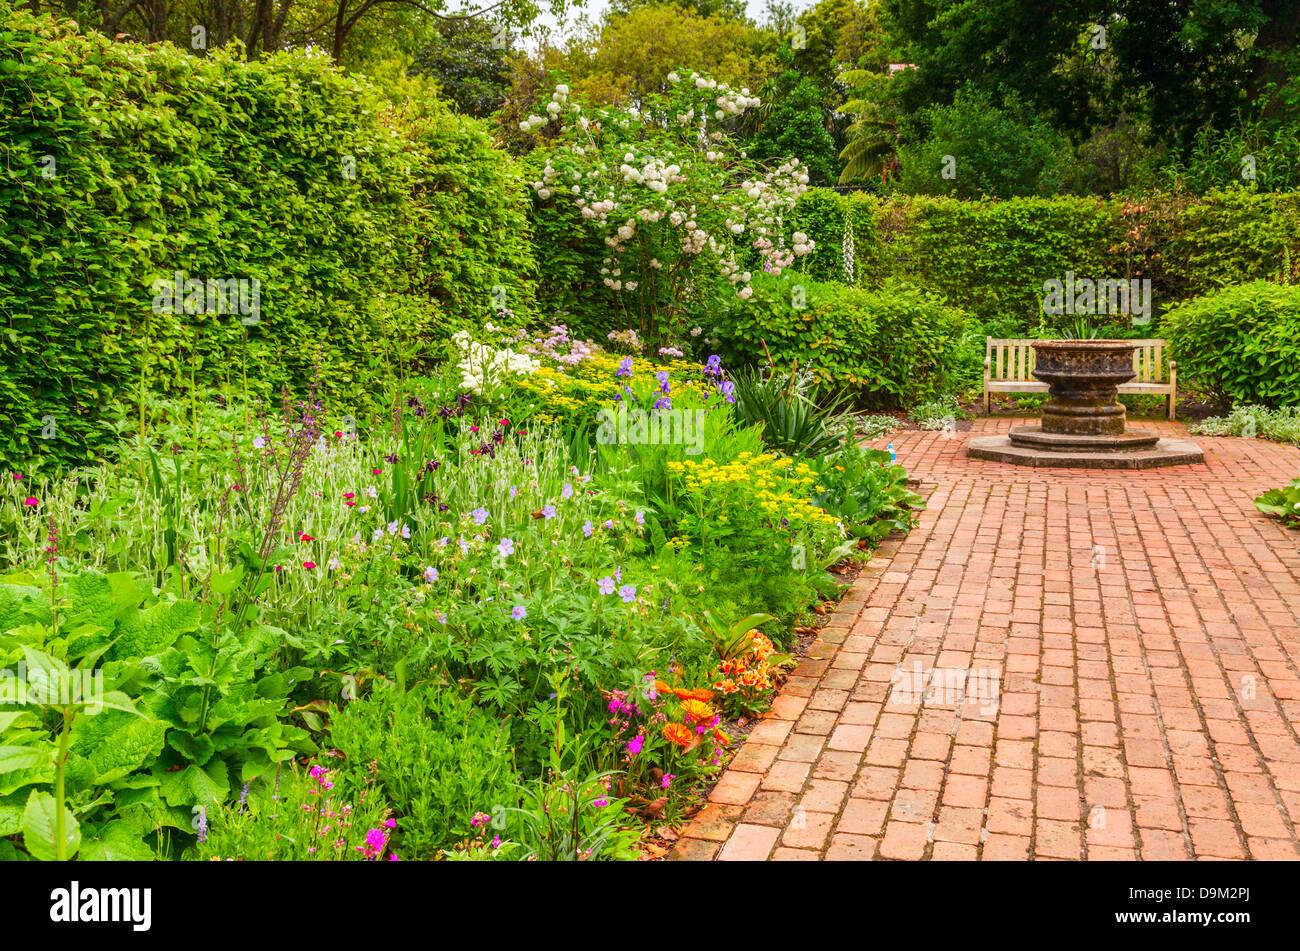 Herbaceous Border,English Flower Garden, Hamilton Gardens, Hamilton, Waikato, New Zealand. - Stock Image